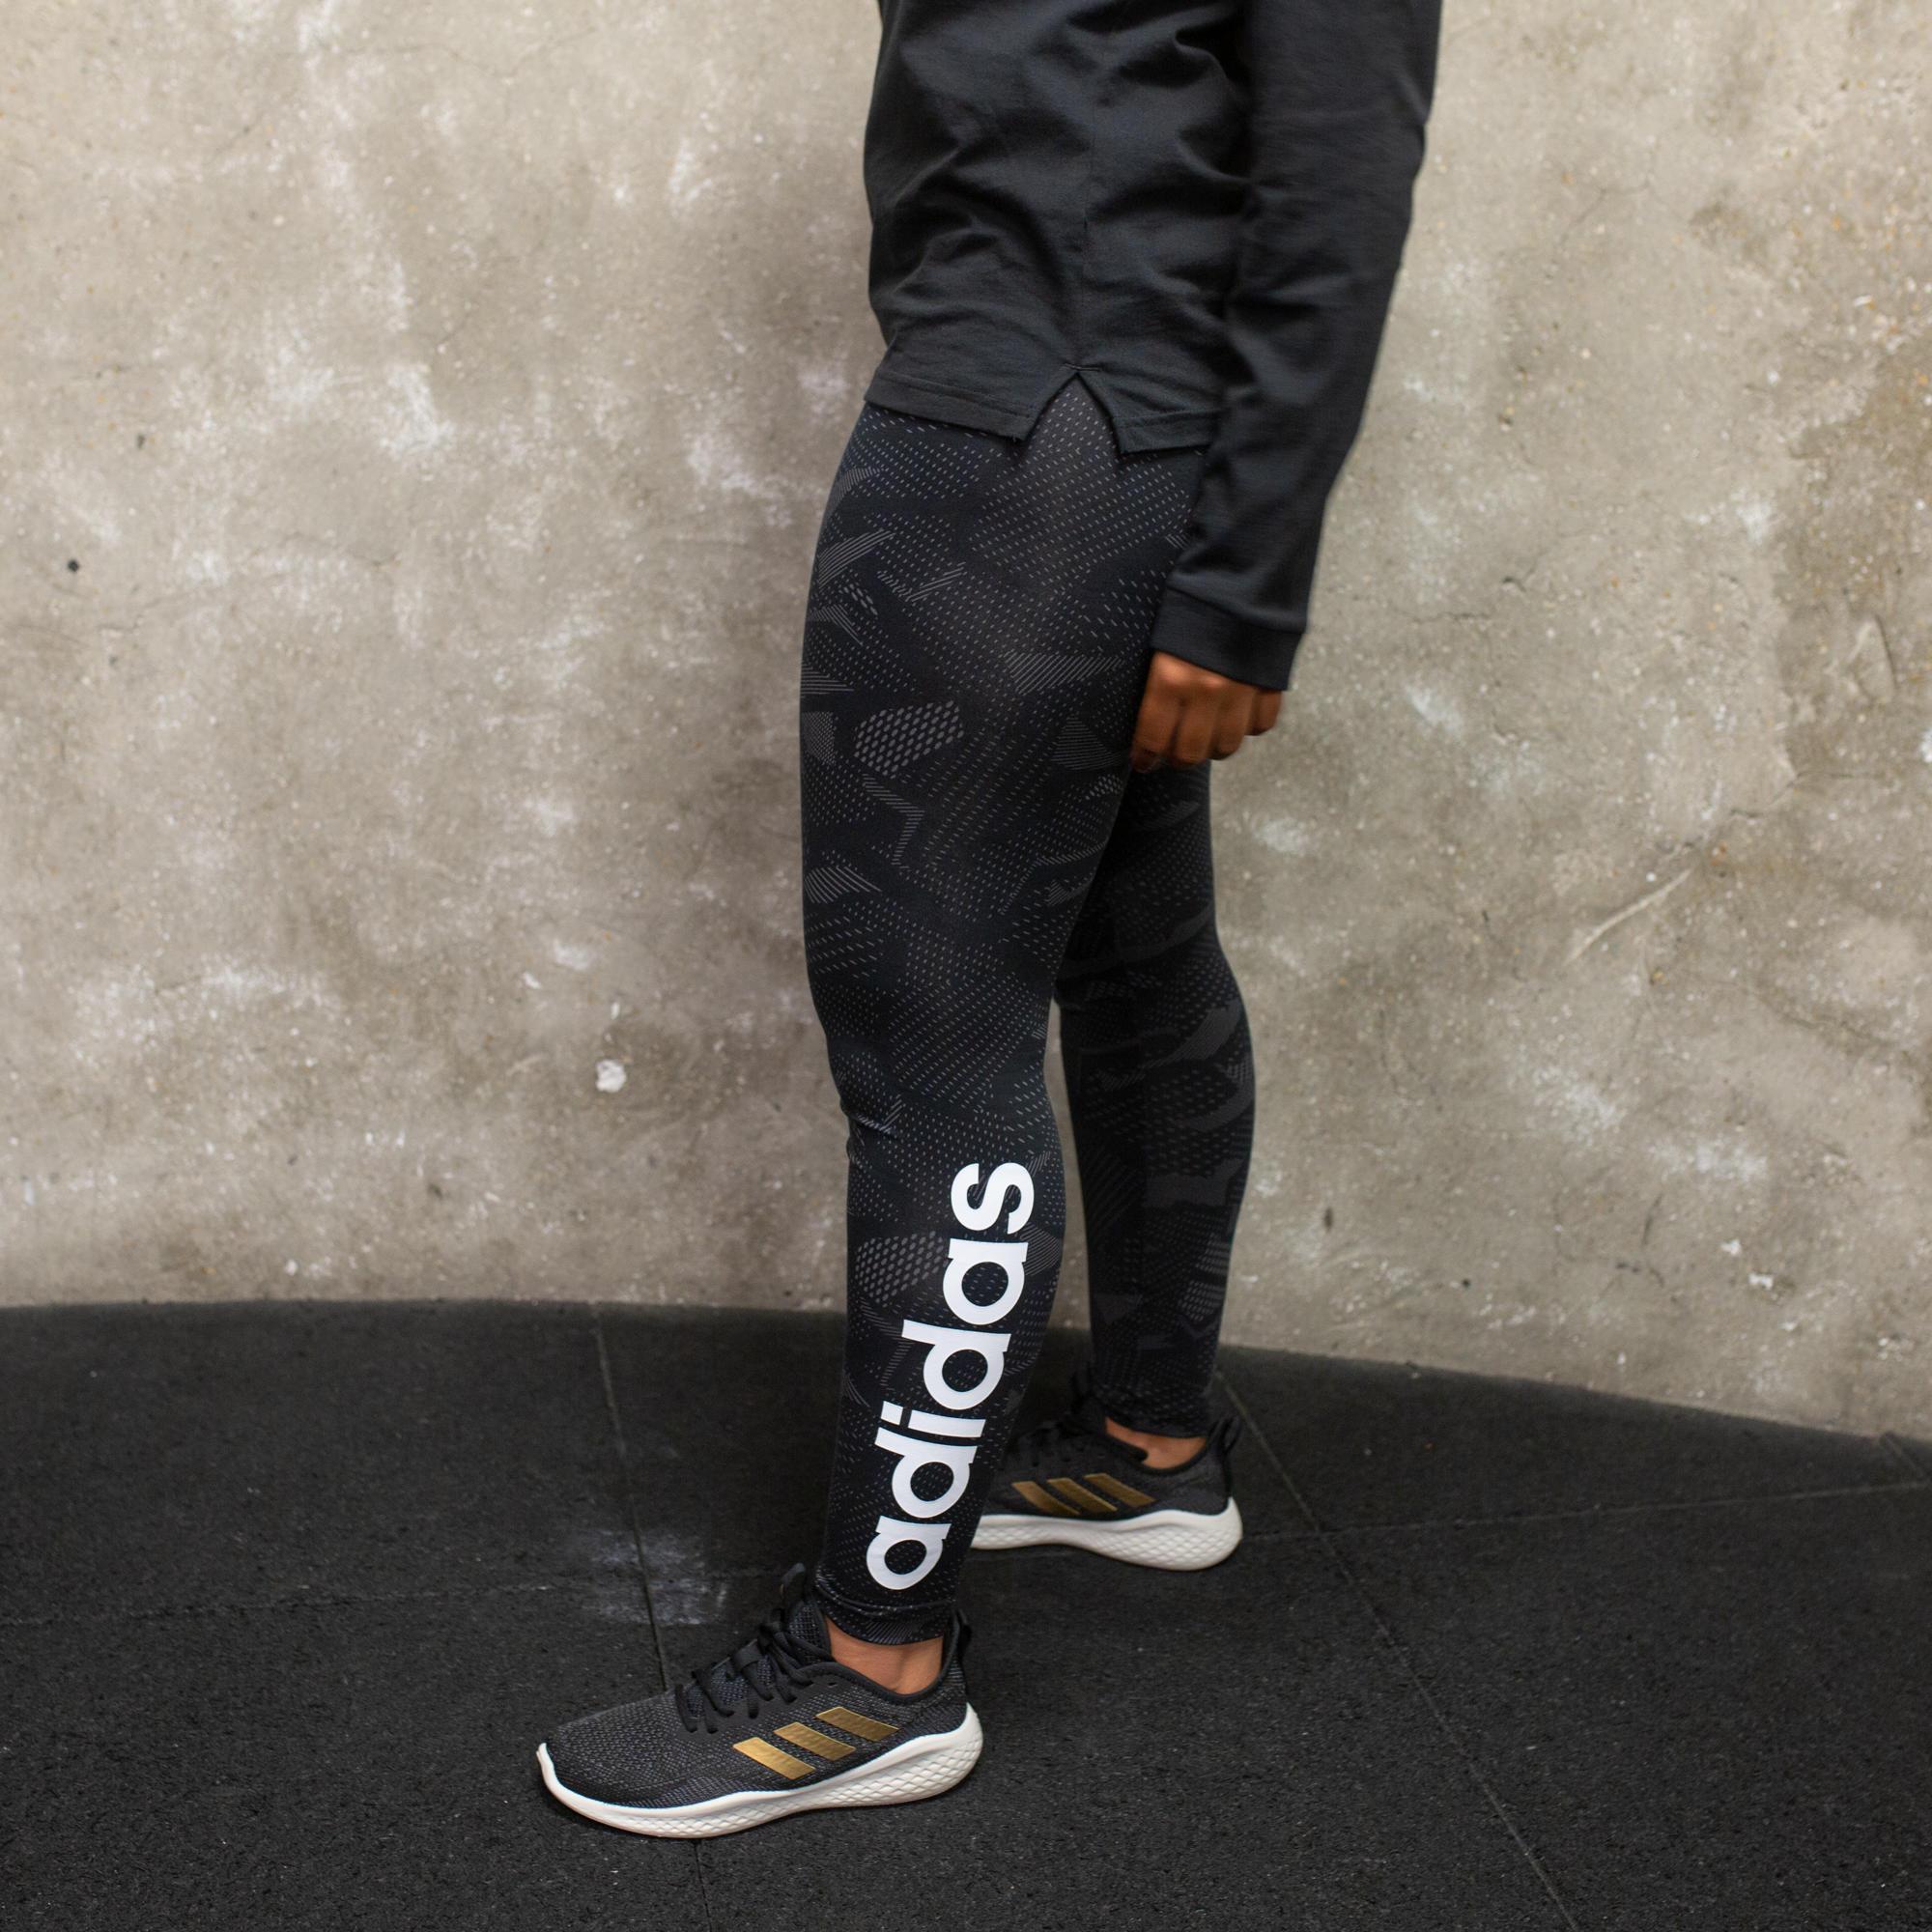 Colanți Adidas pilates damă imagine